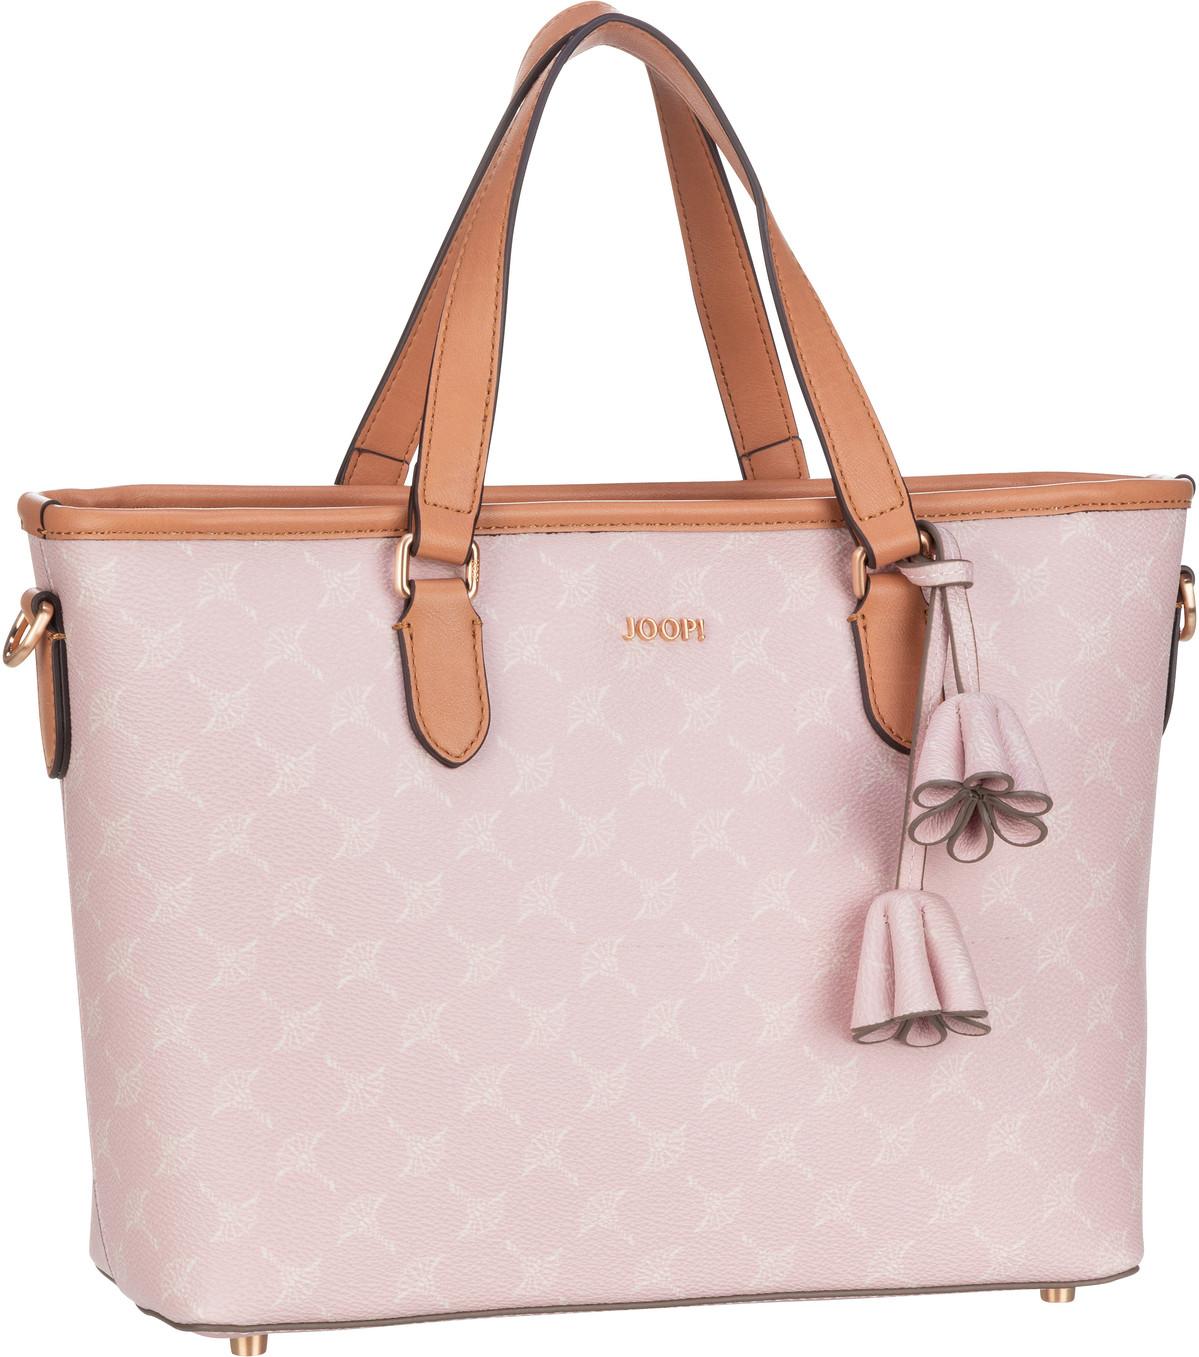 Handtasche Cortina Ketty HandBag SHZ Rose